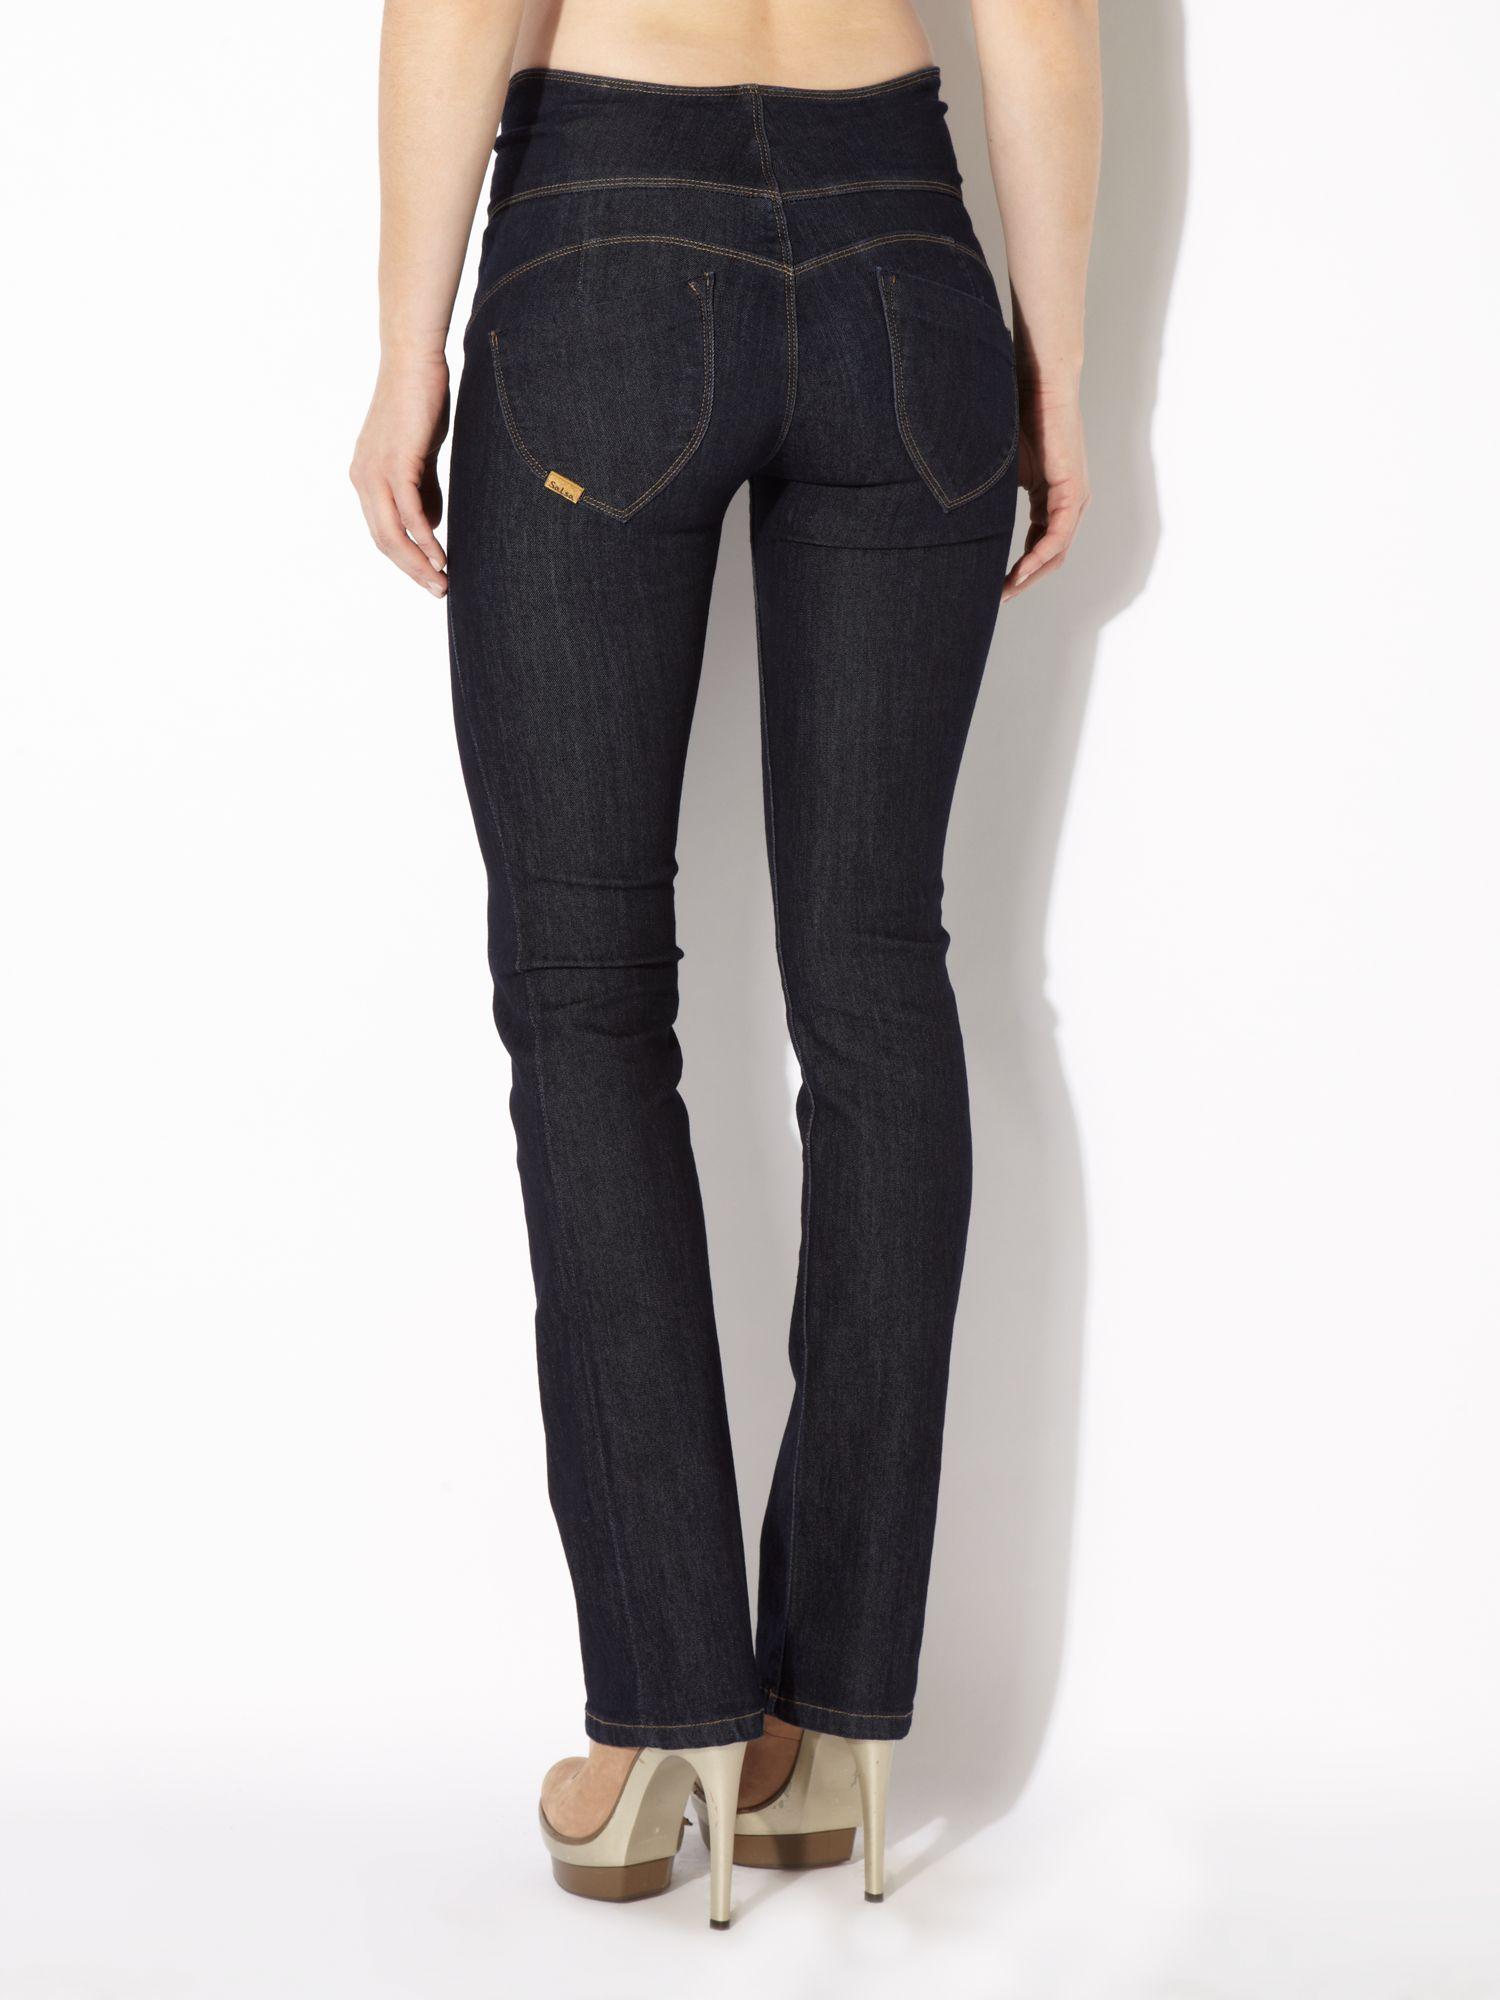 lyst salsa sculpture slim leg jeans in rinse in blue. Black Bedroom Furniture Sets. Home Design Ideas